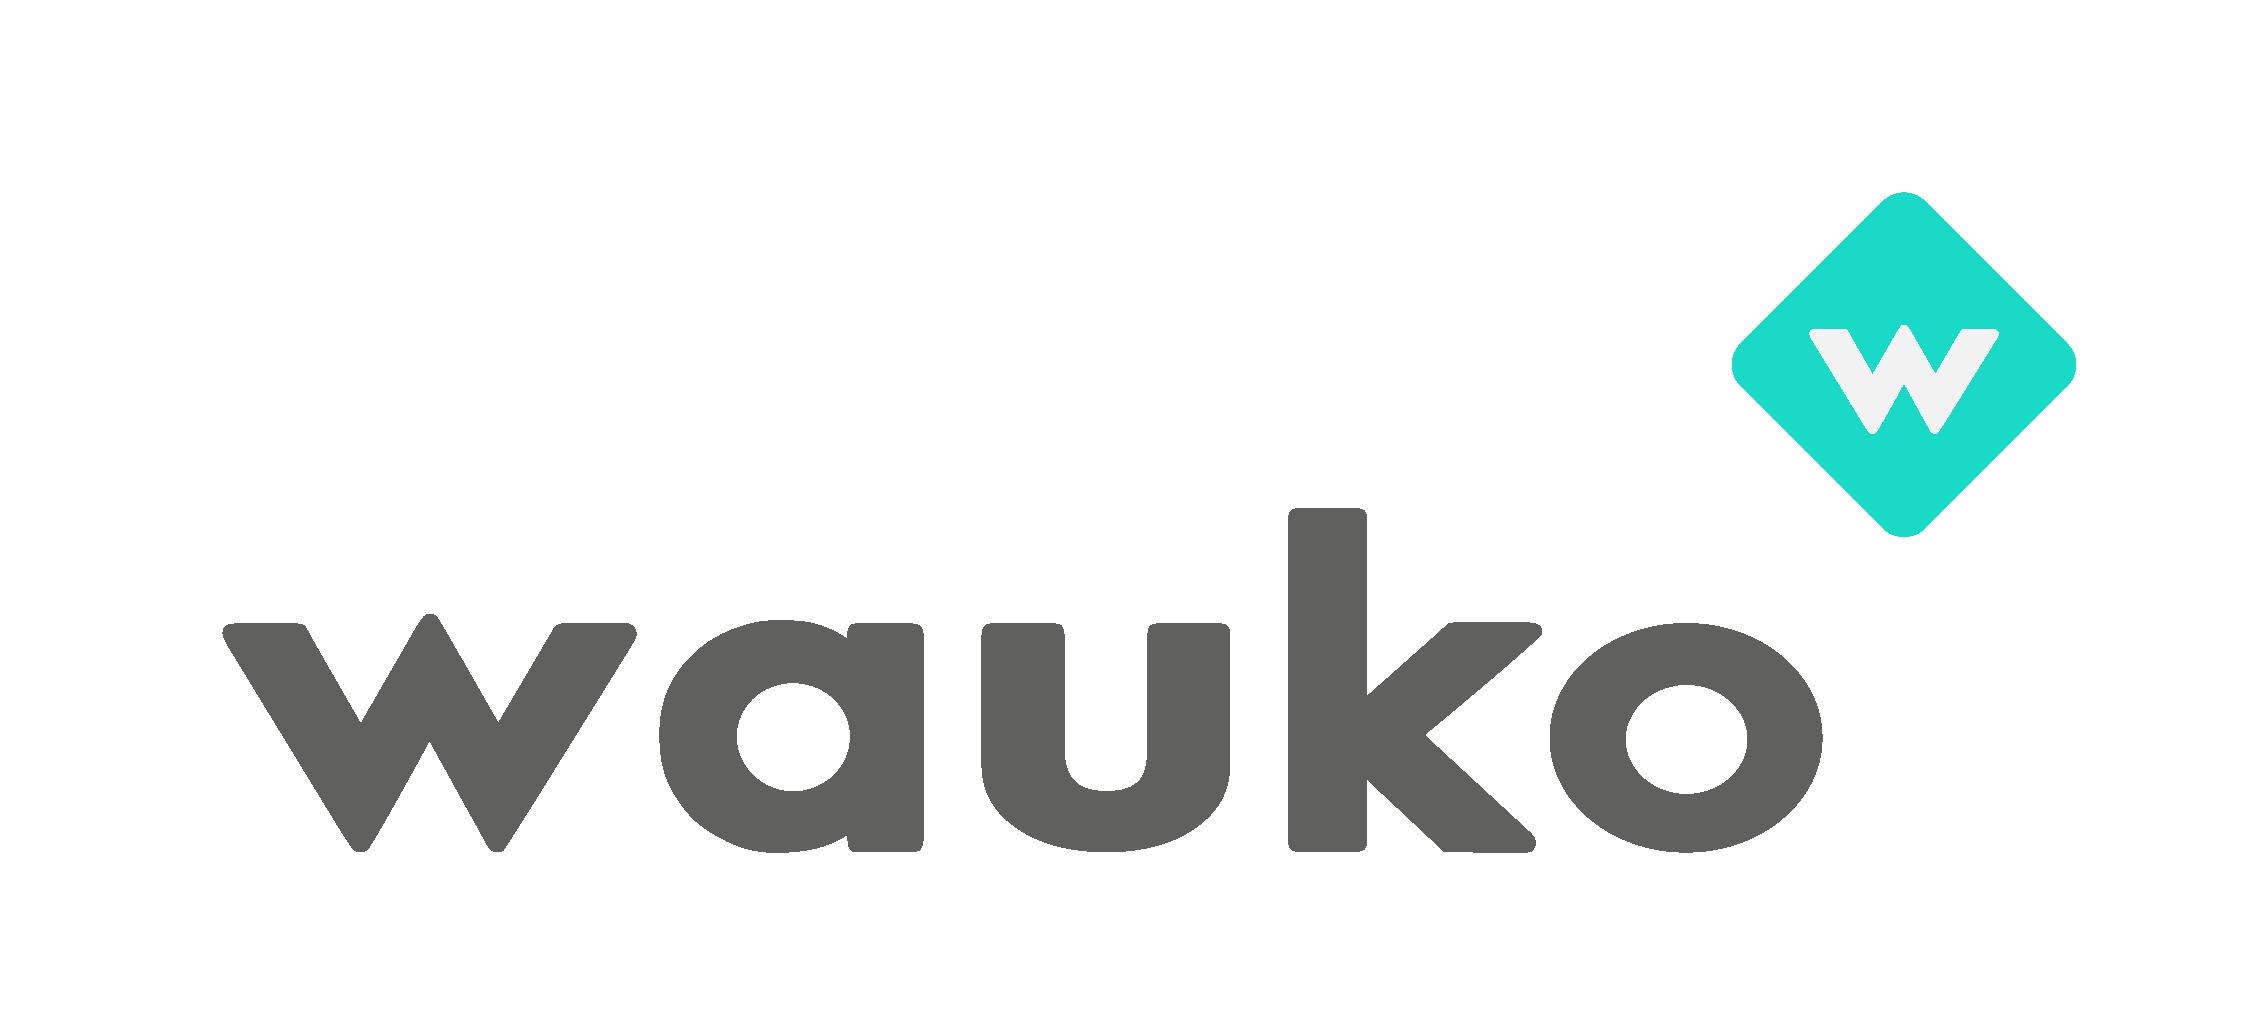 Wauko_Colour-02